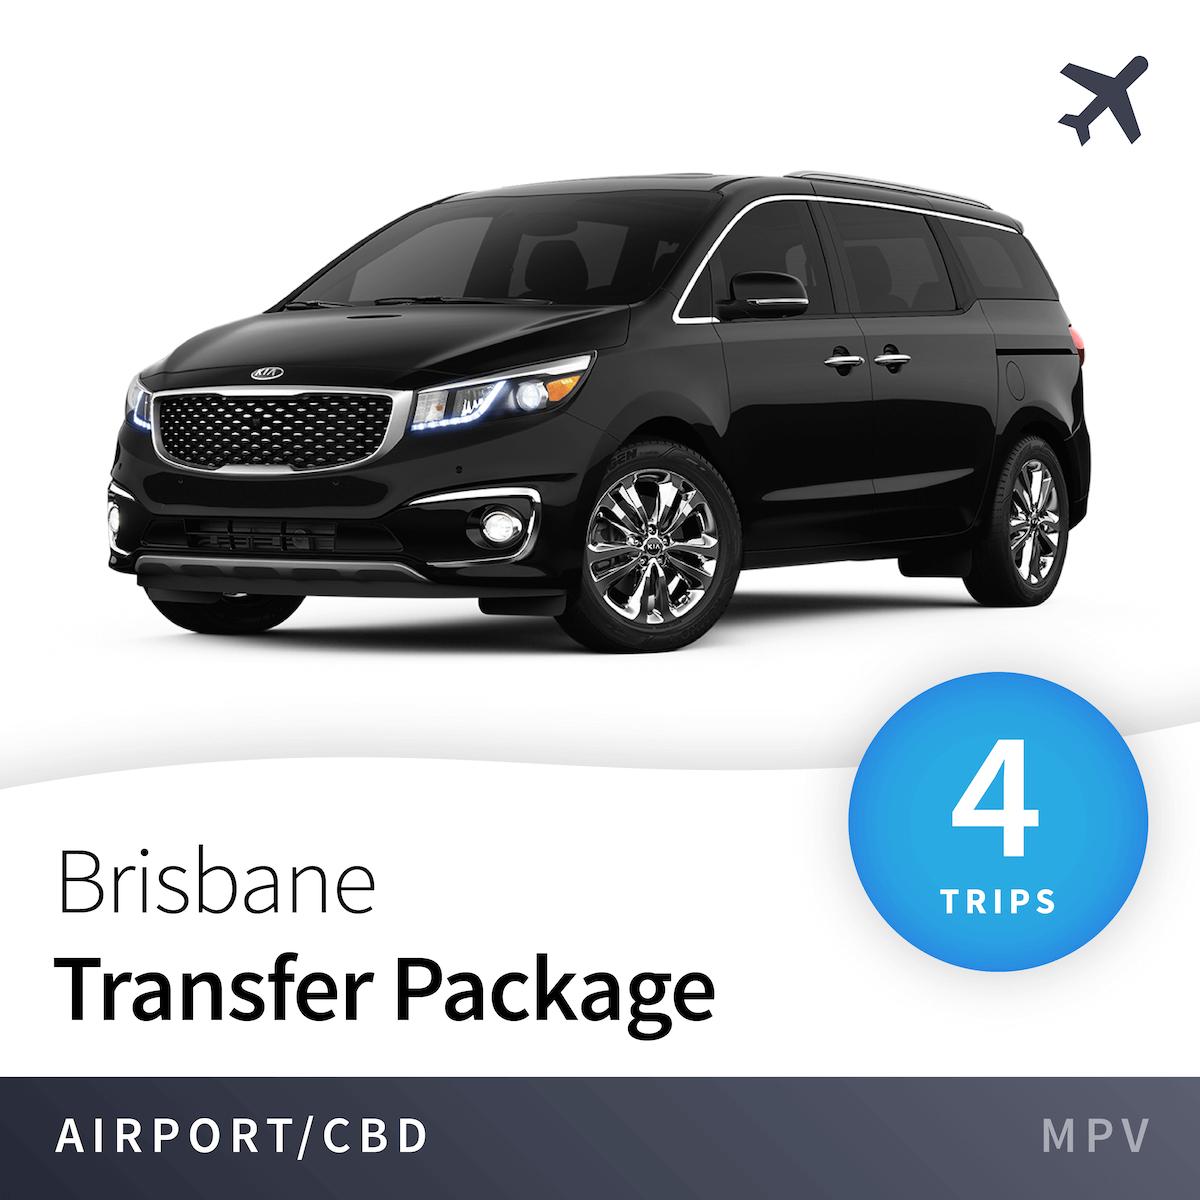 Brisbane Airport Transfer Package - MPV (4 Trips) 1